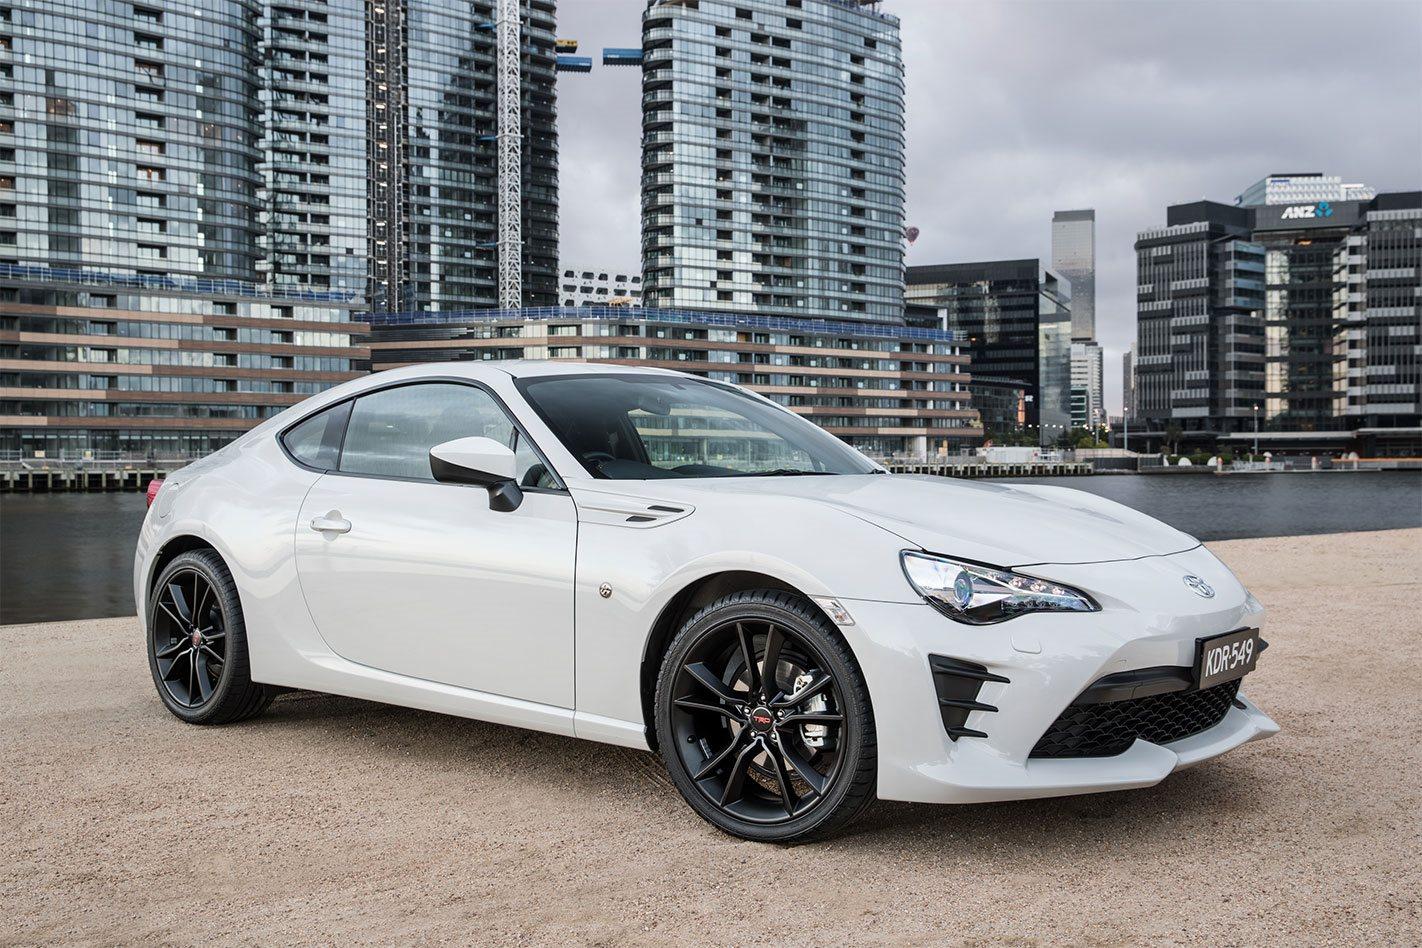 2017 Toyota 86 Scores Trd Upgrades